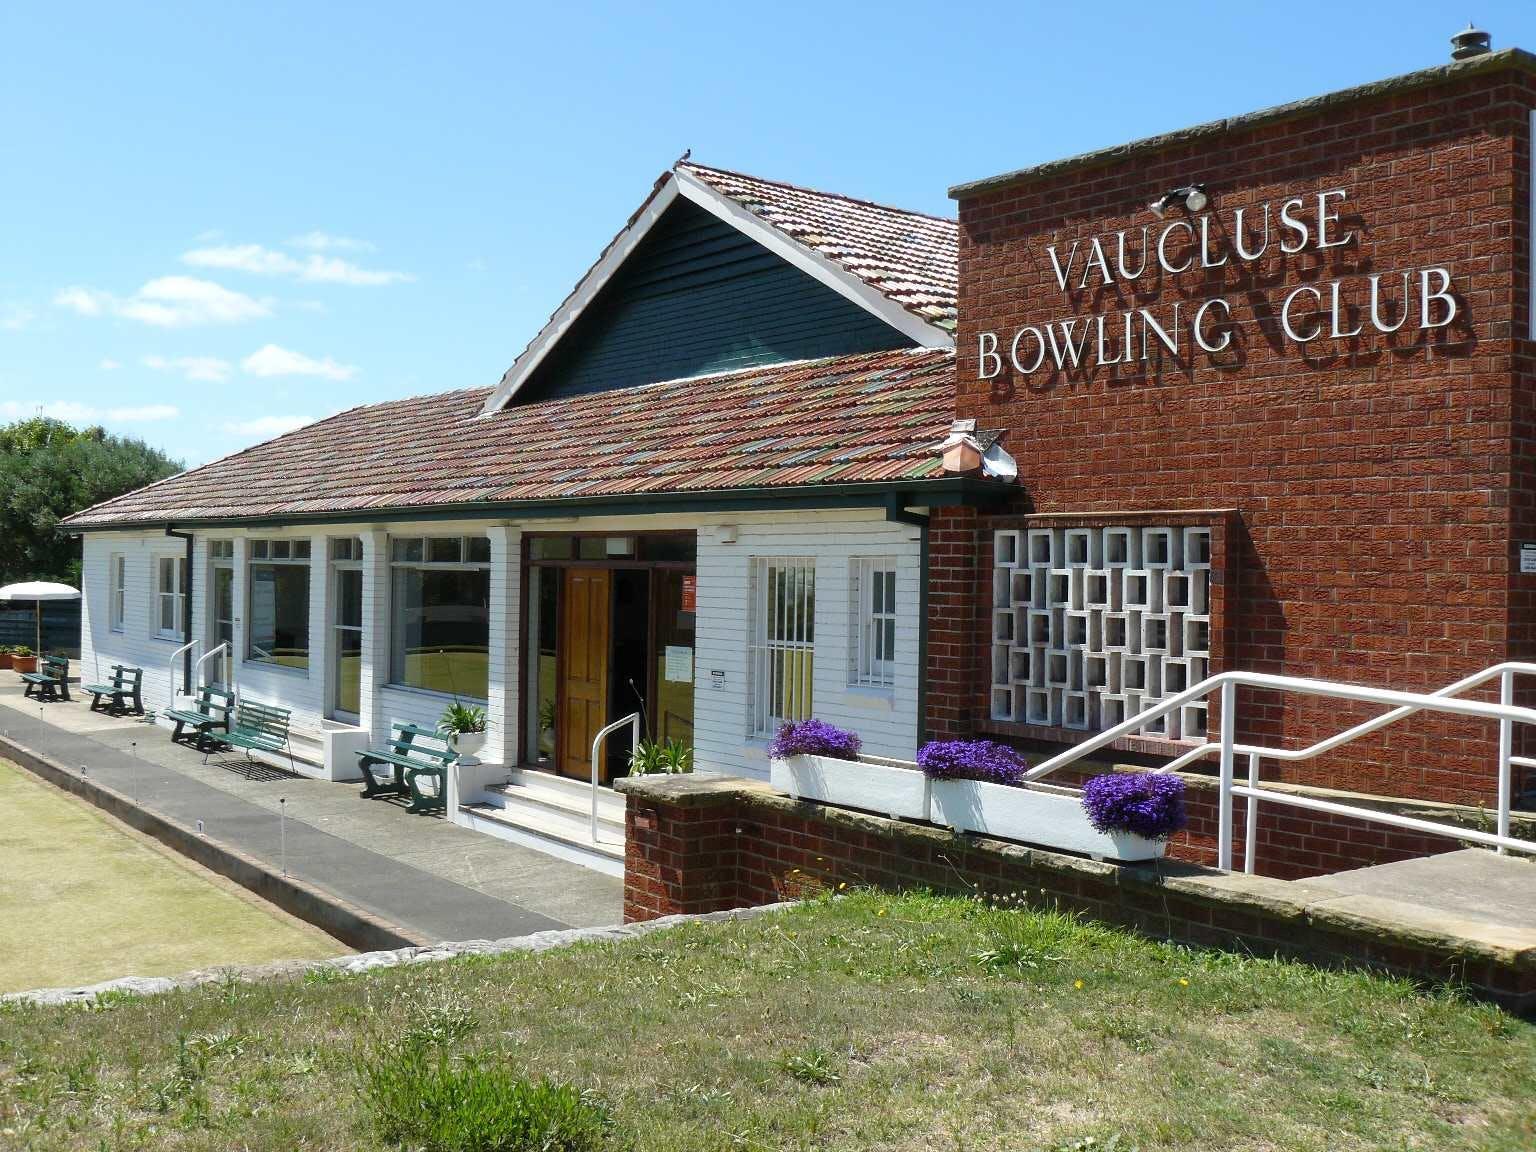 Vaucluse Bowling Club - exterior